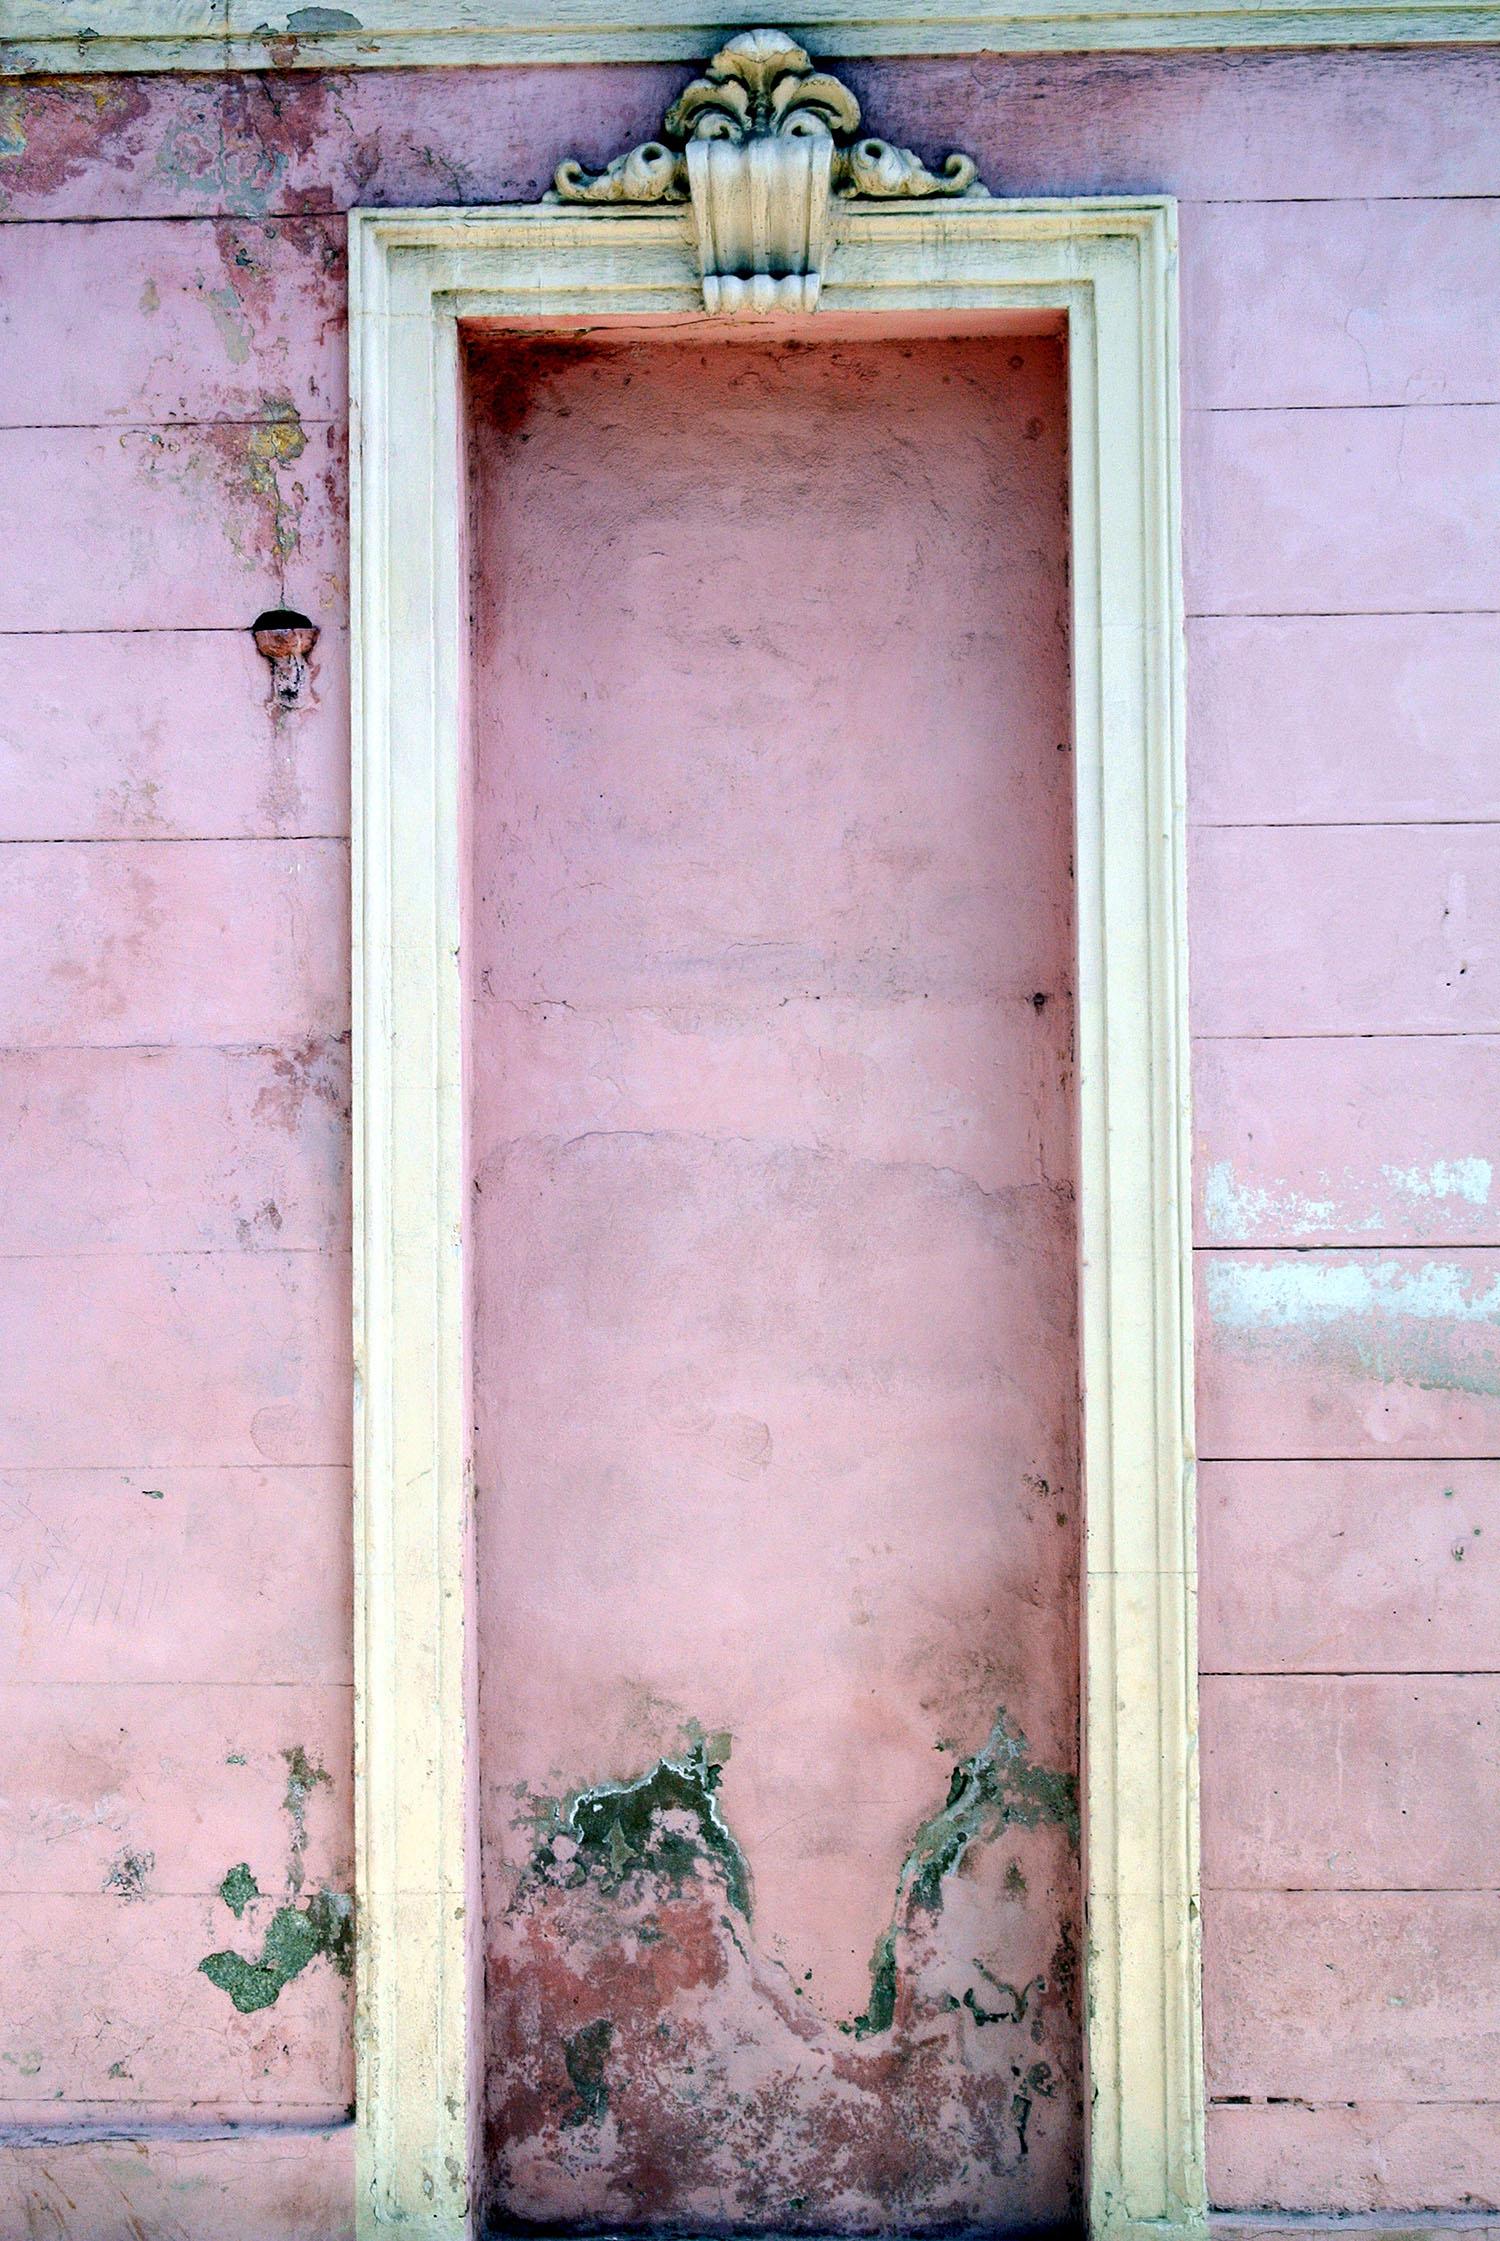 havana-city-wall-with-pink-alcove.jpg